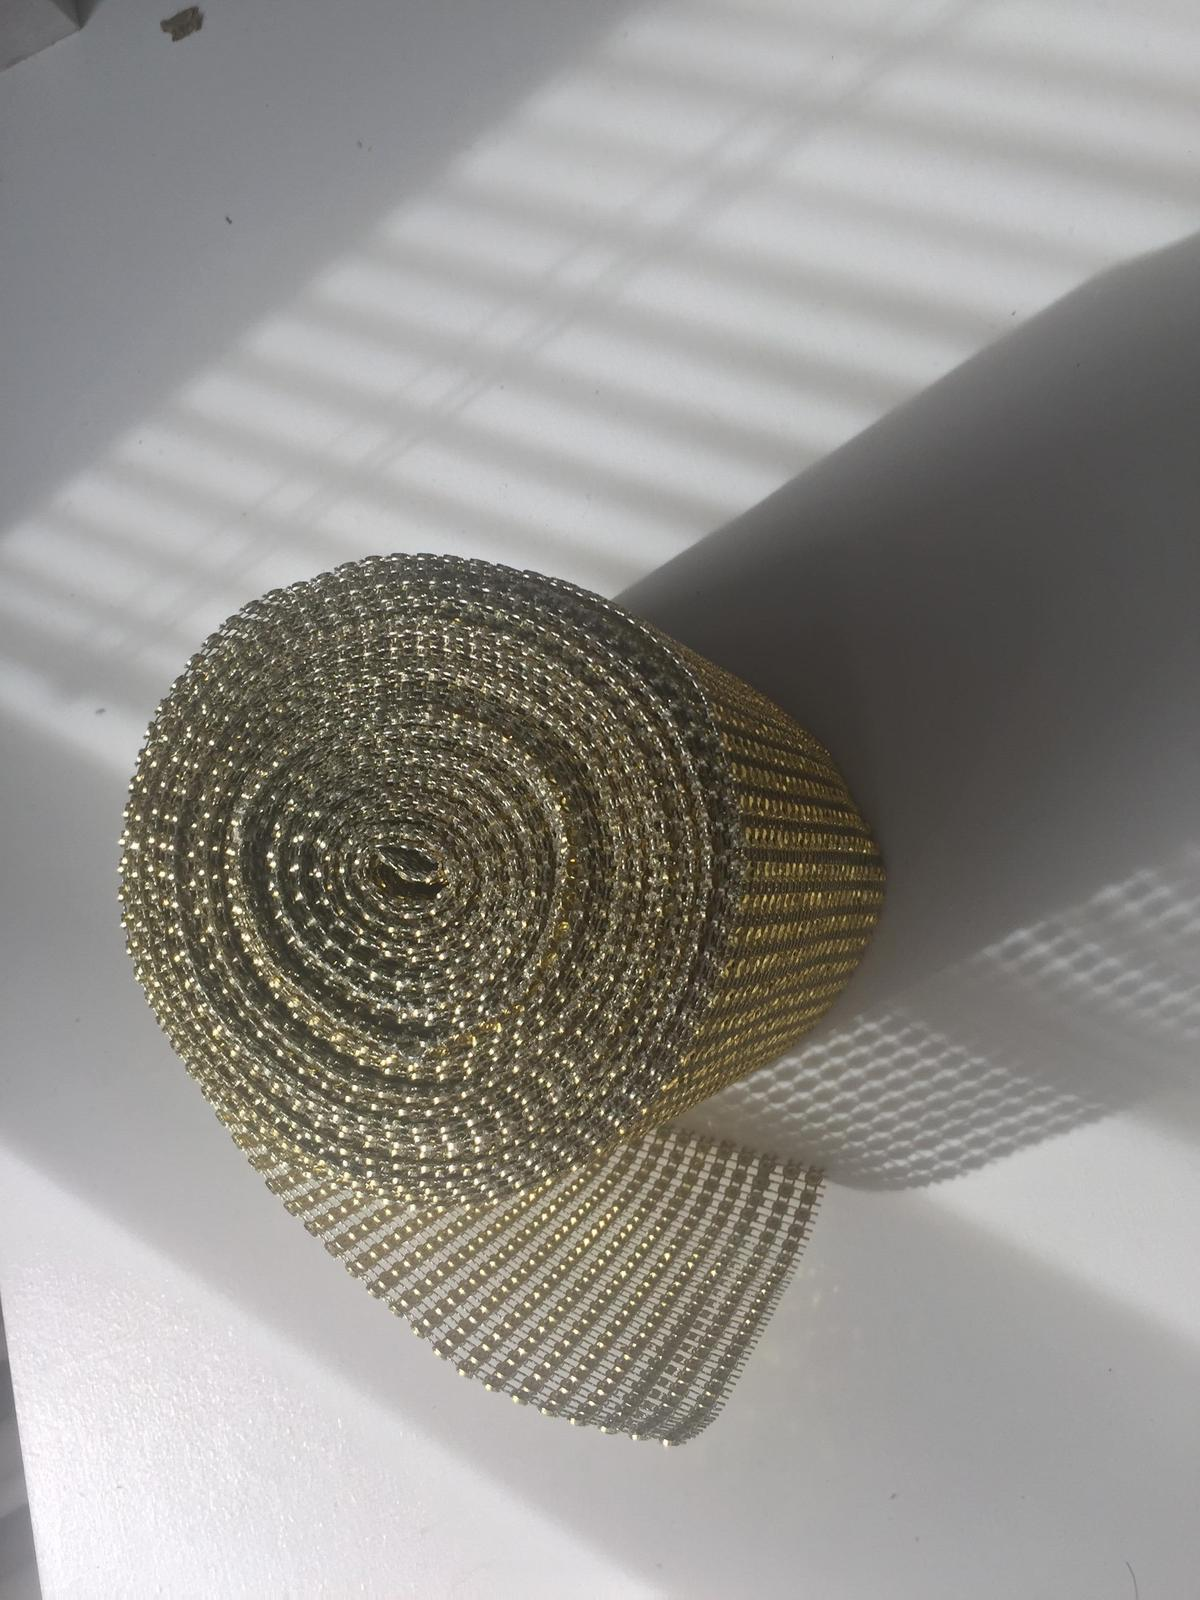 Zlata strasova stola na stol  - Obrázok č. 2